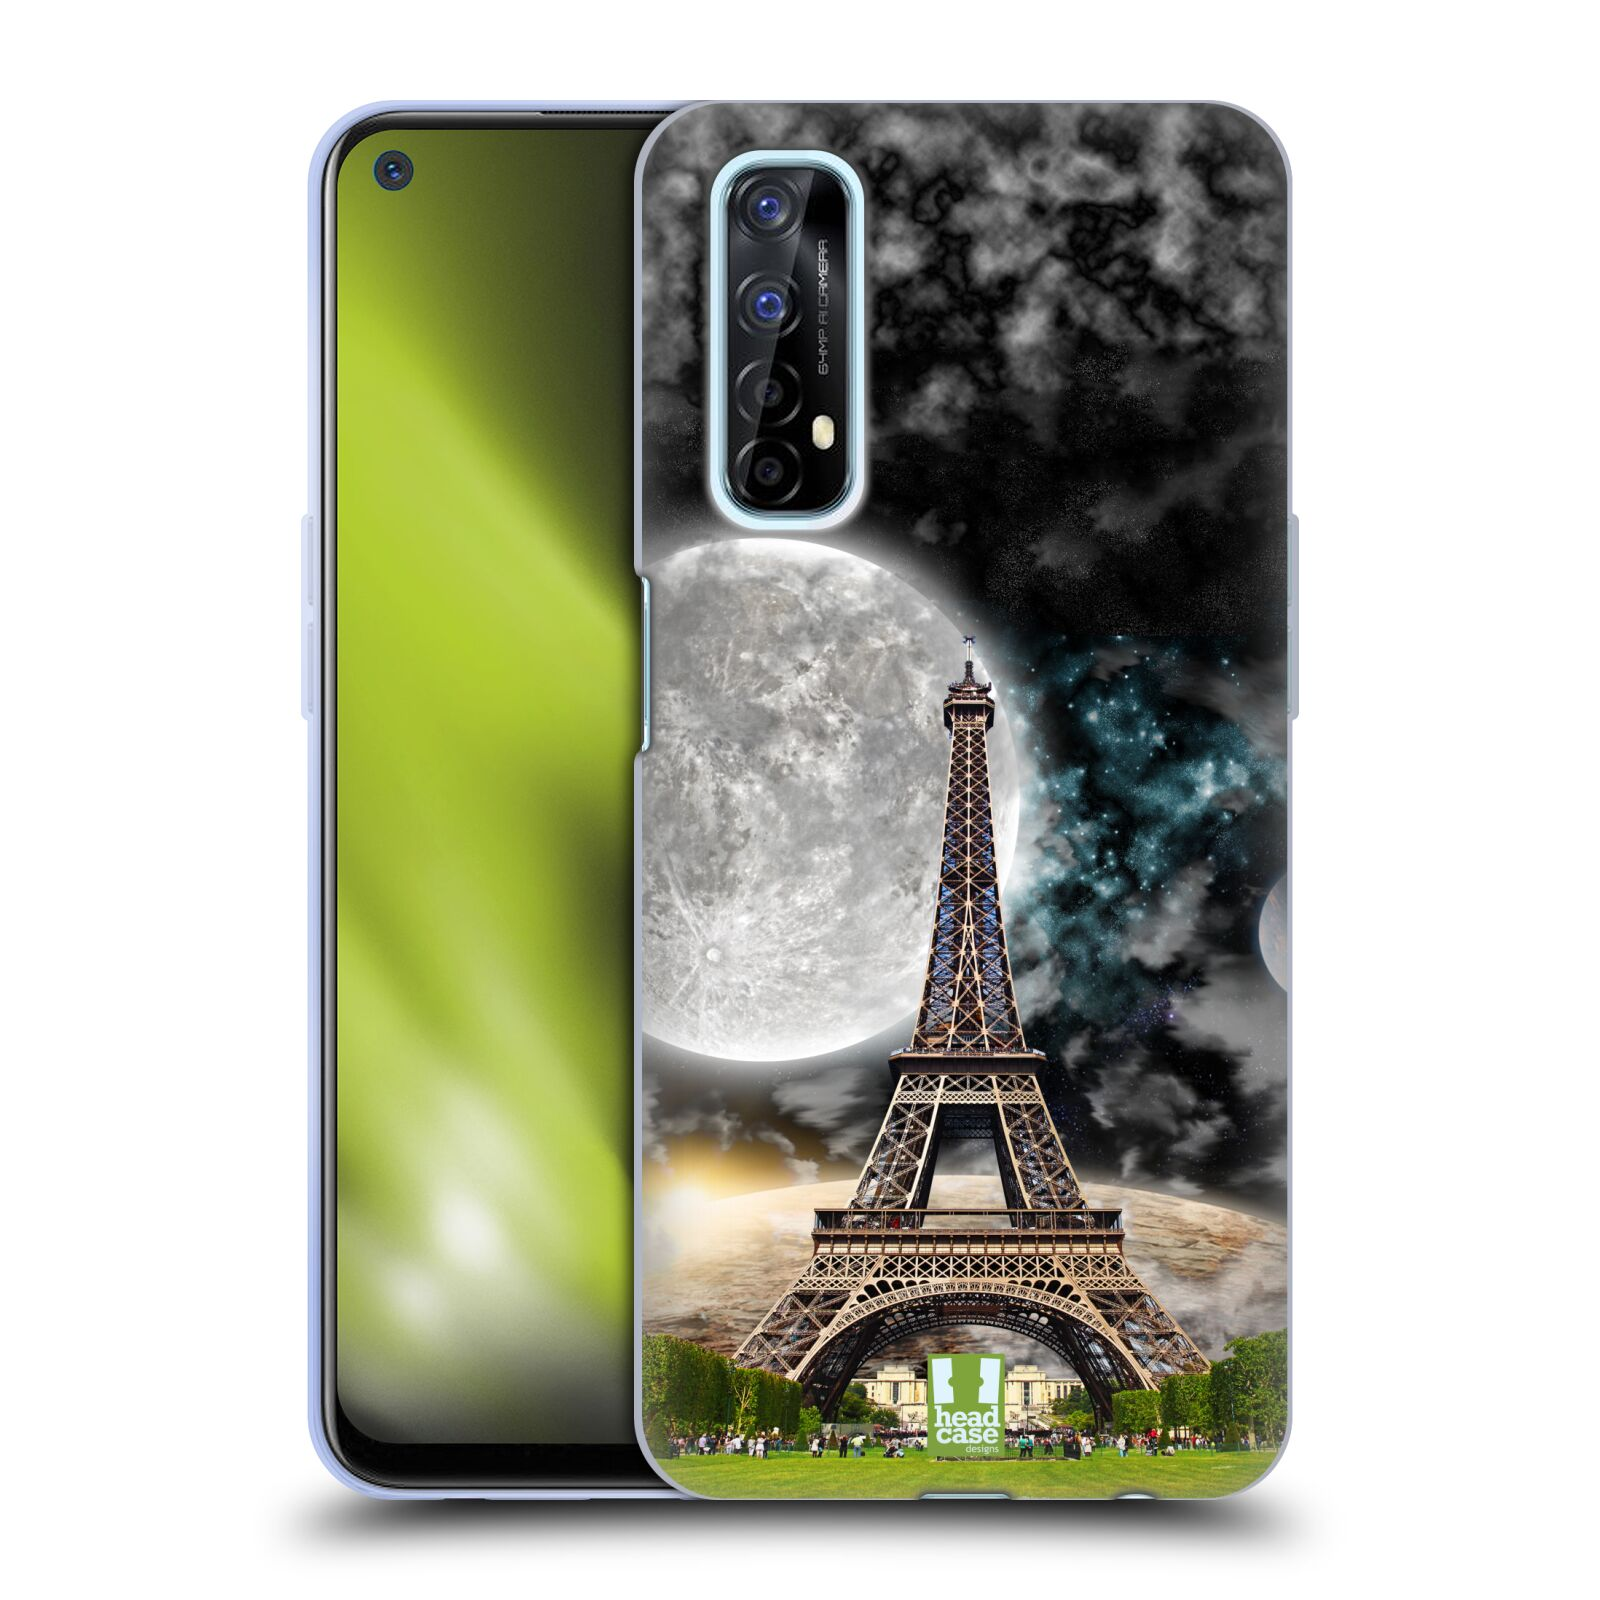 Silikonové pouzdro na mobil Realme 7 - Head Case - Měsíční aifelovka